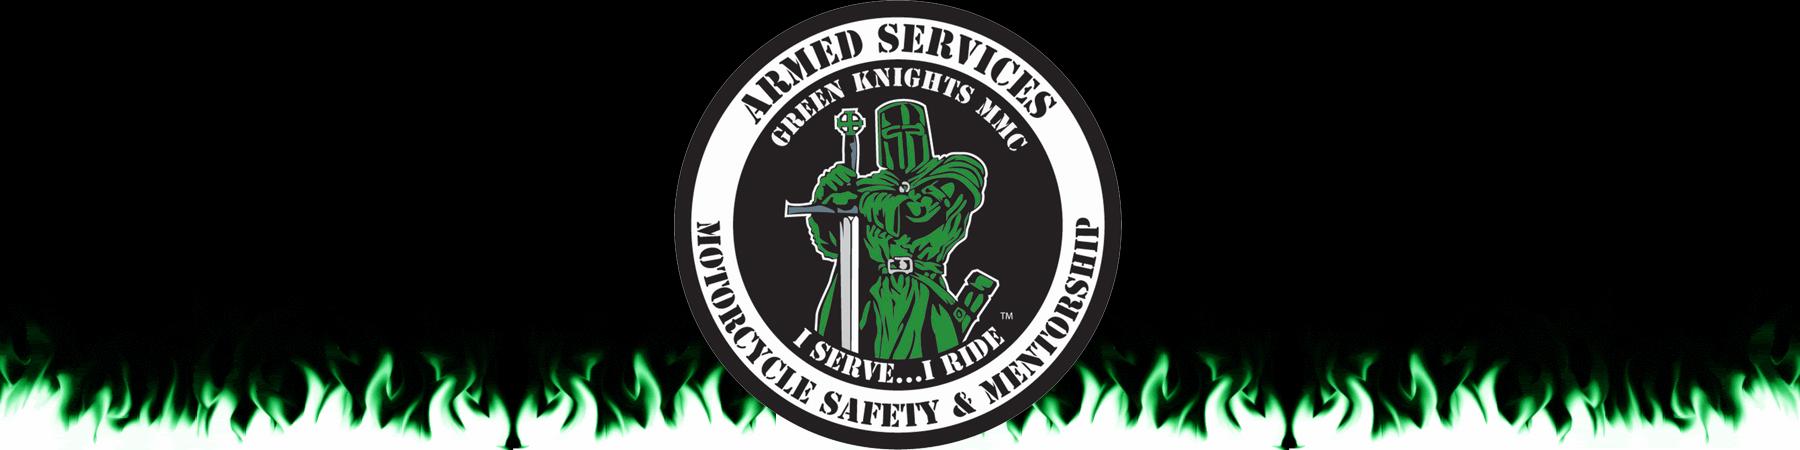 I Serve...I Ride™